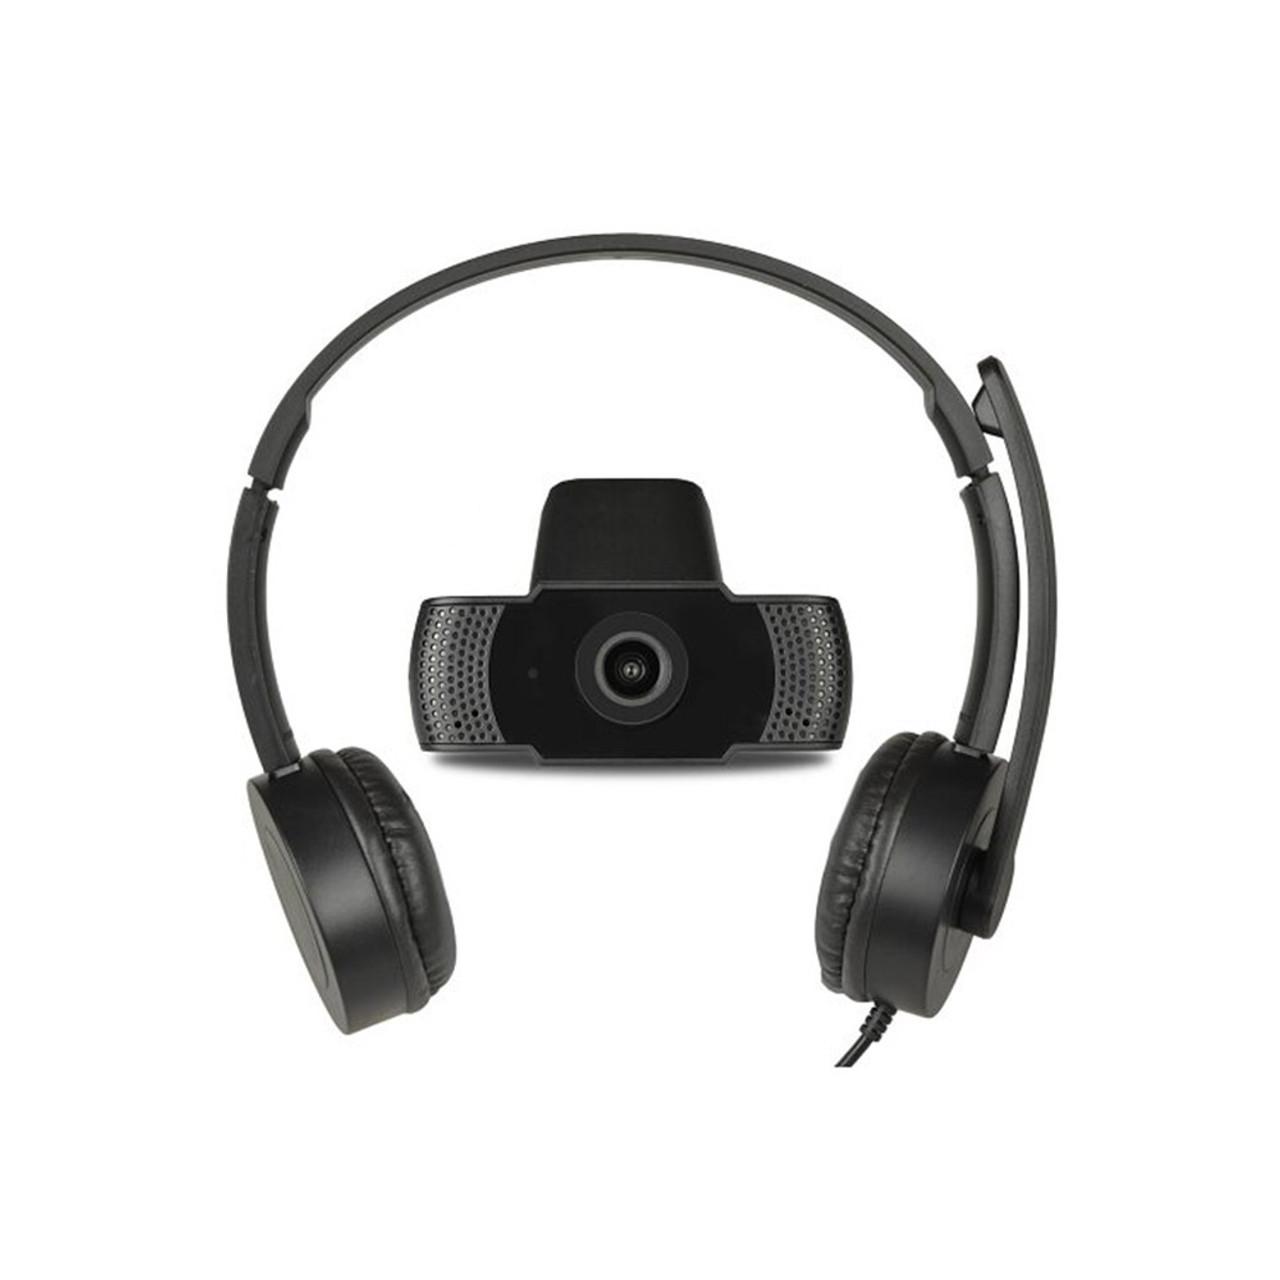 USB Online Meeting FHD USB Webcam & Stereo Headset Kit